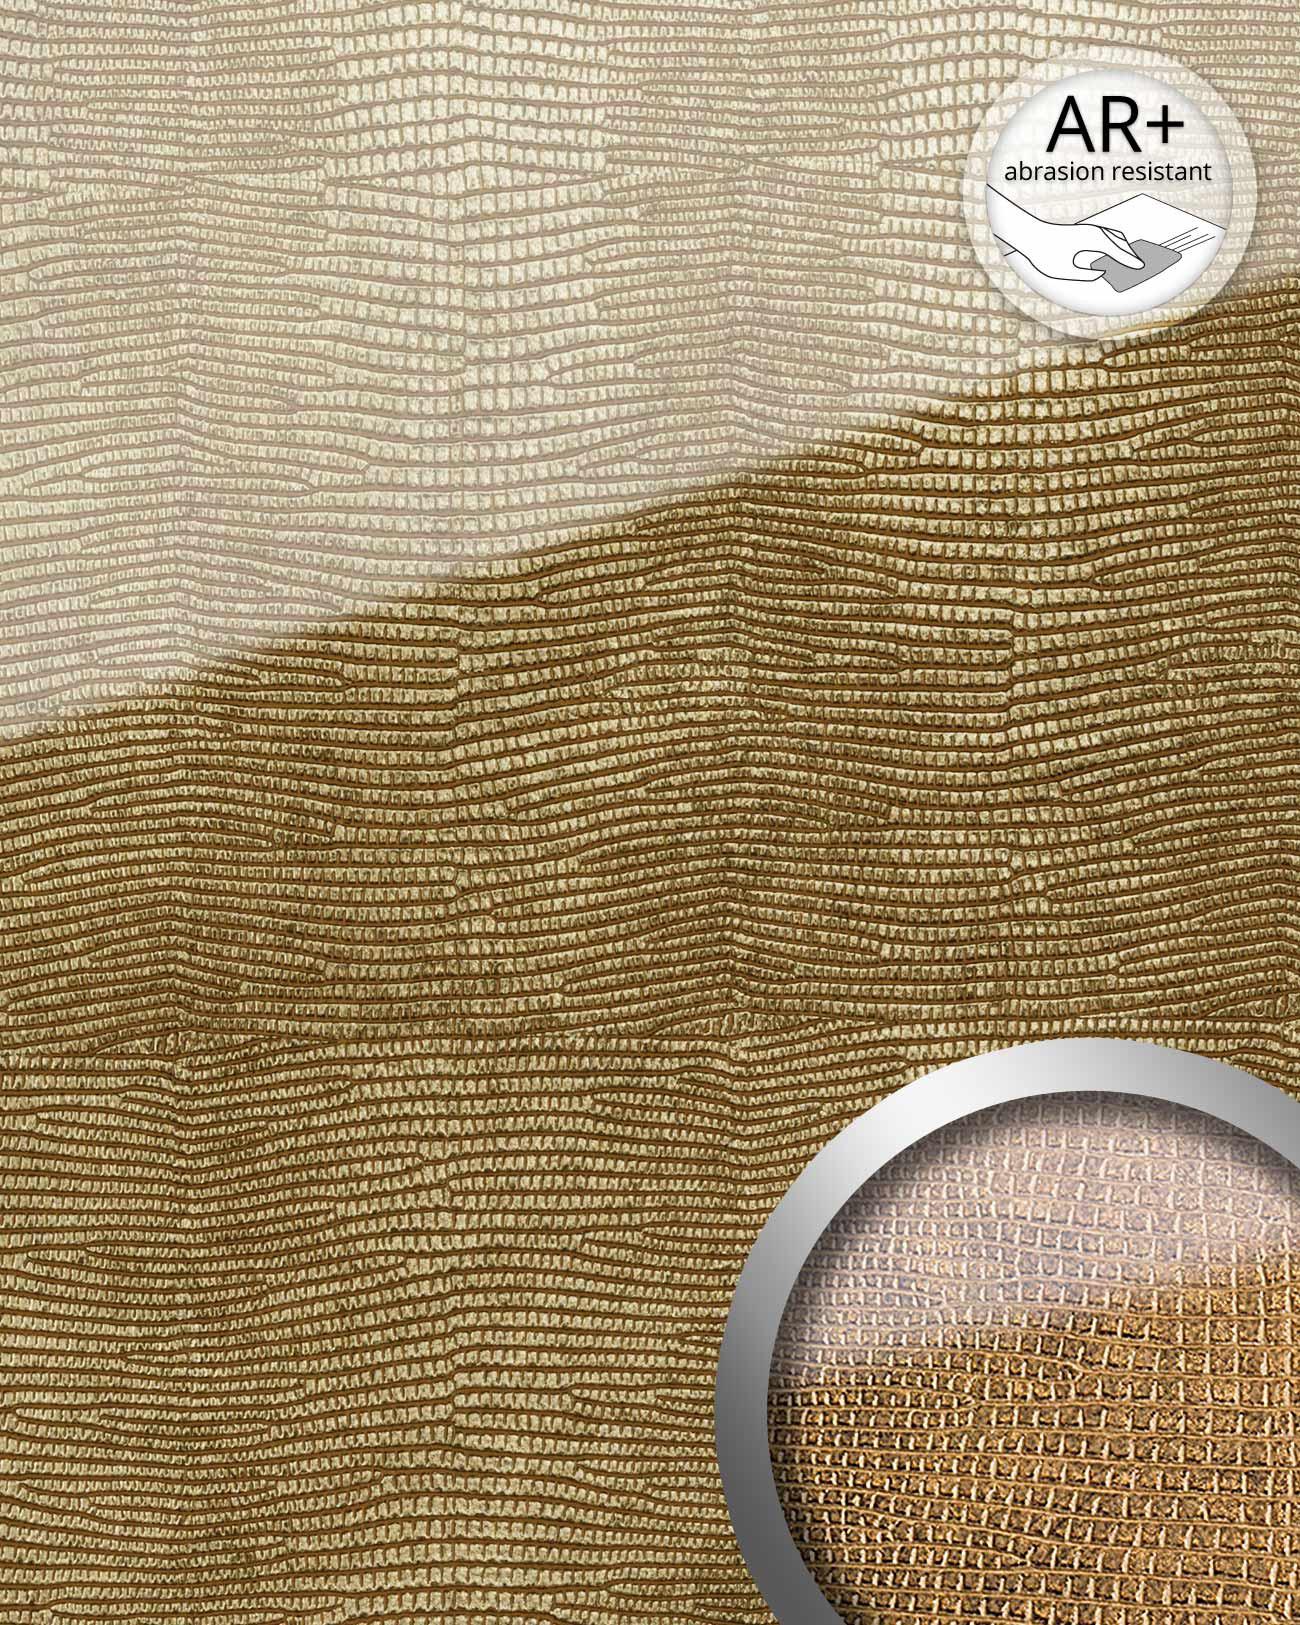 wandpaneel glas optik wallface 16982 leguan luxus dekor wandverkleidung abriebfest selbstklebend. Black Bedroom Furniture Sets. Home Design Ideas